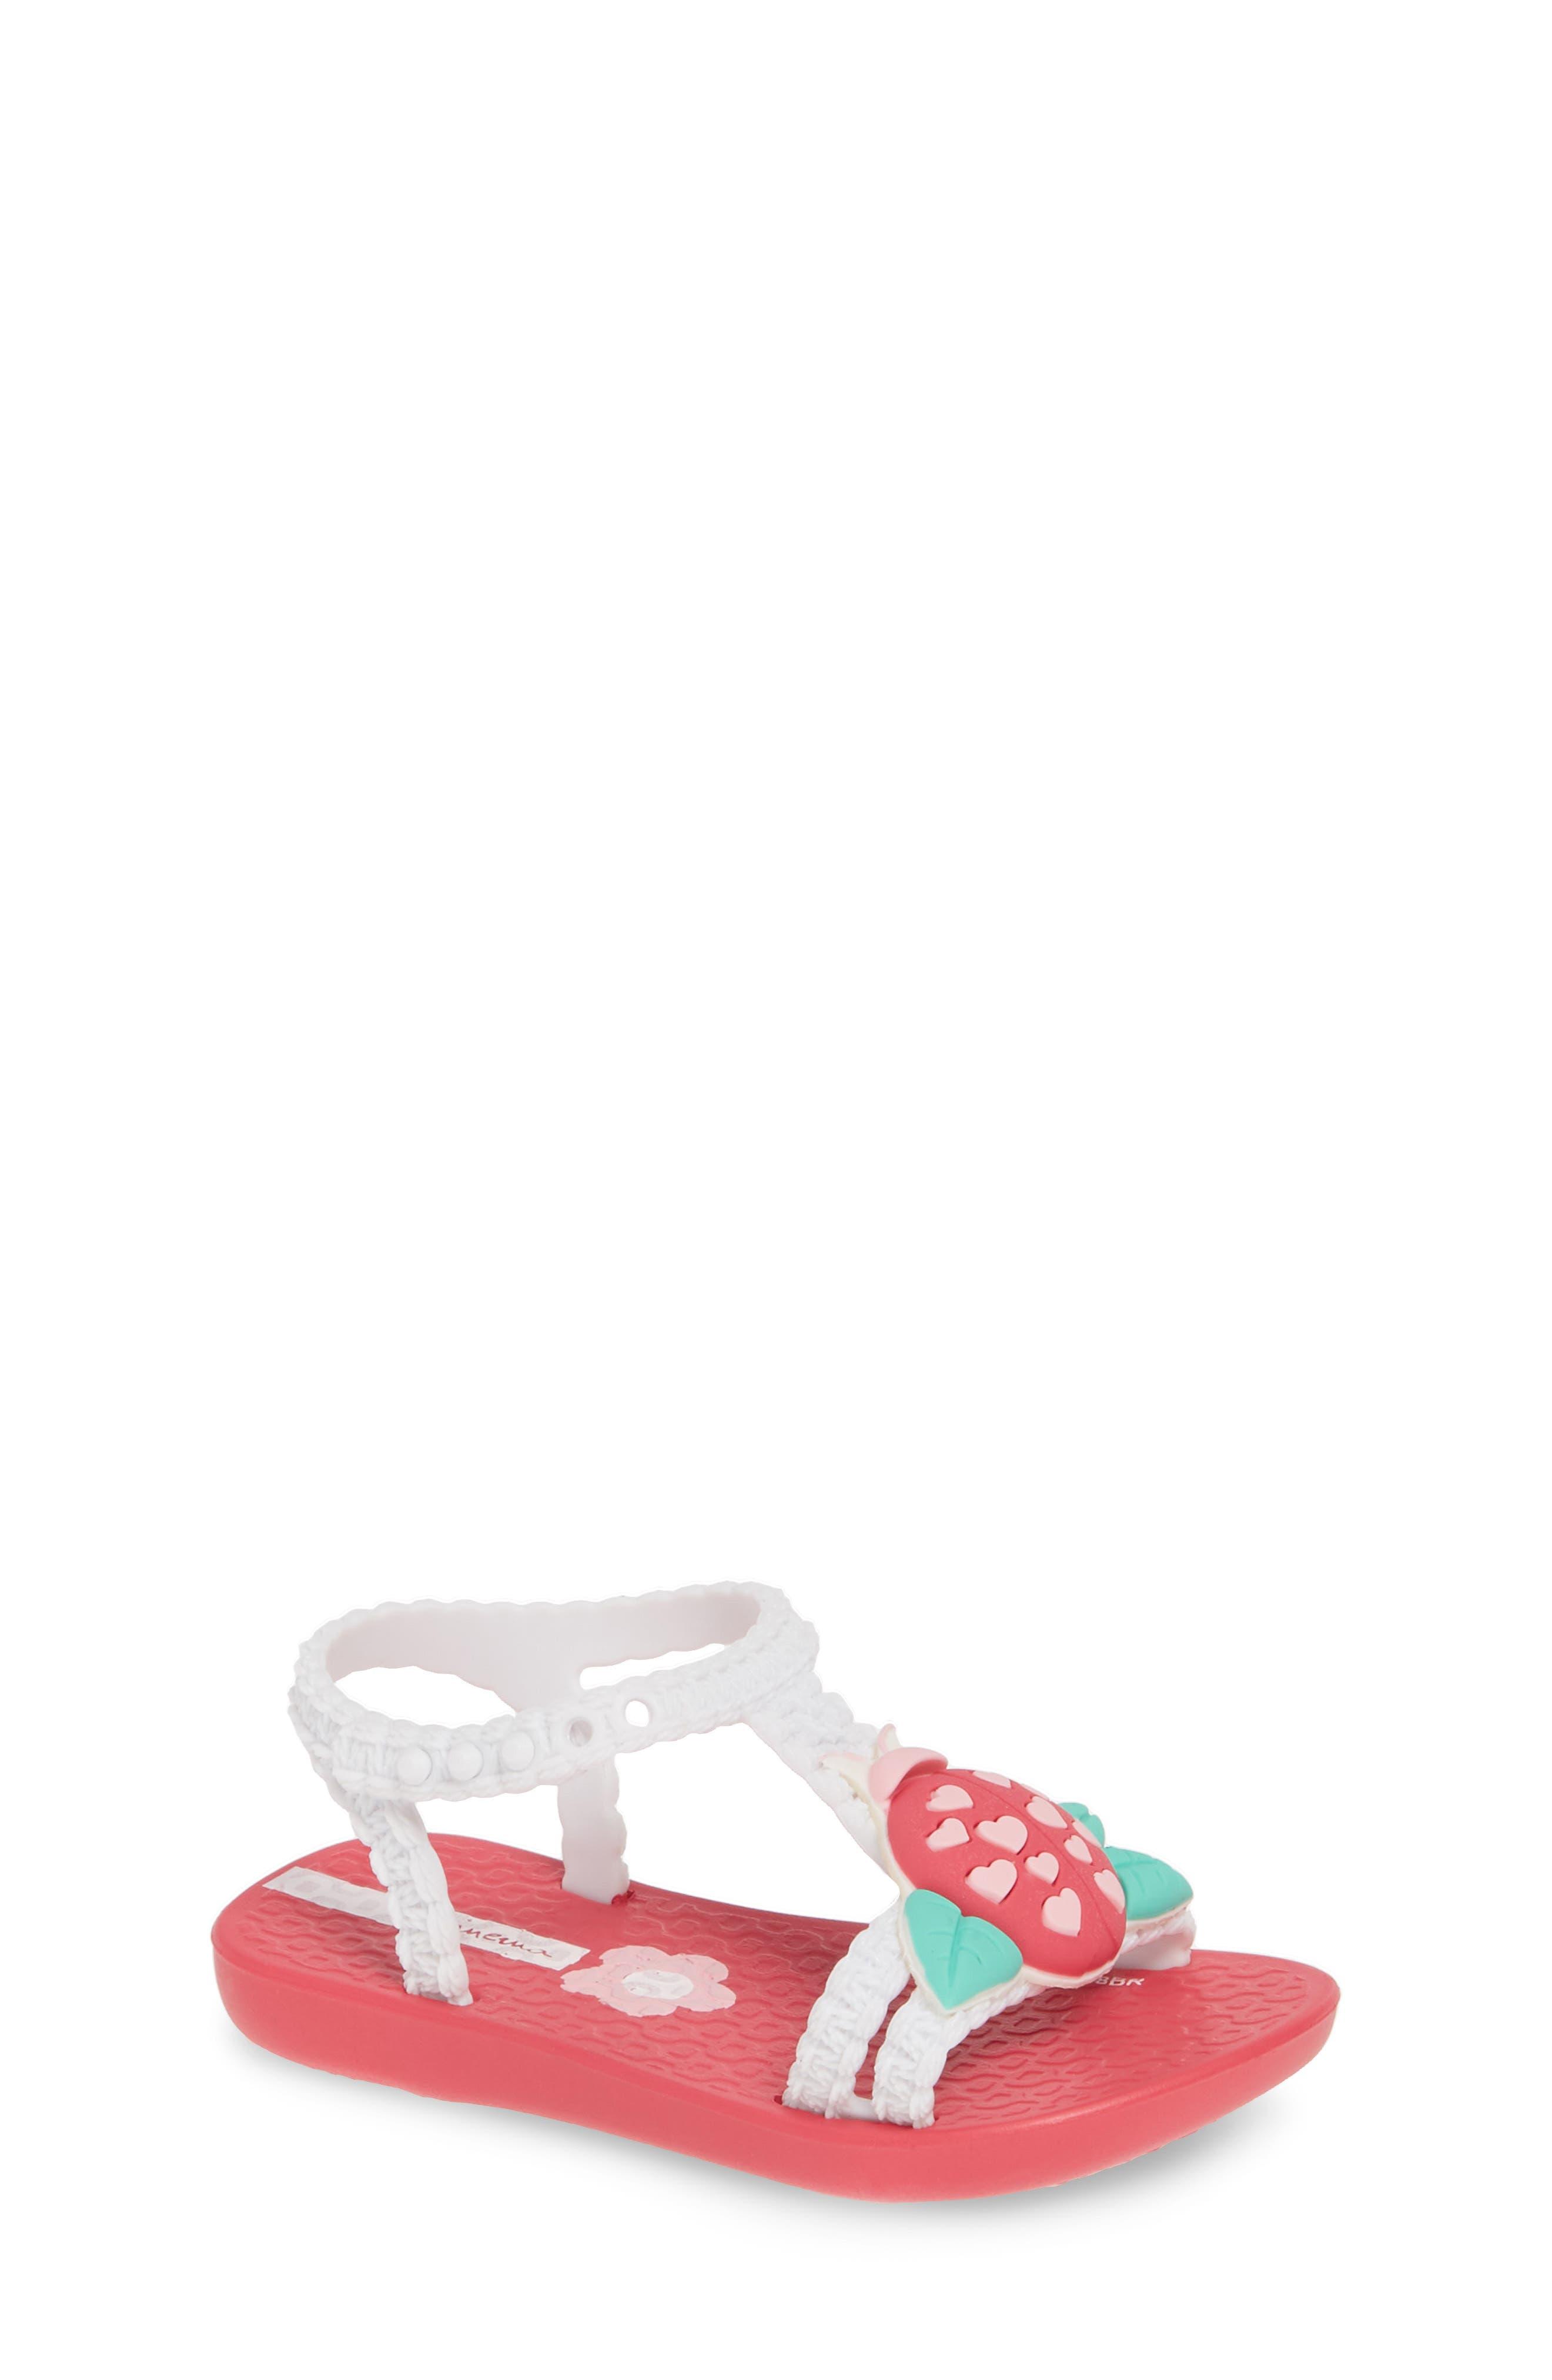 IPANEMA Buggy Baby Sandal, Main, color, PINK/ WHITE